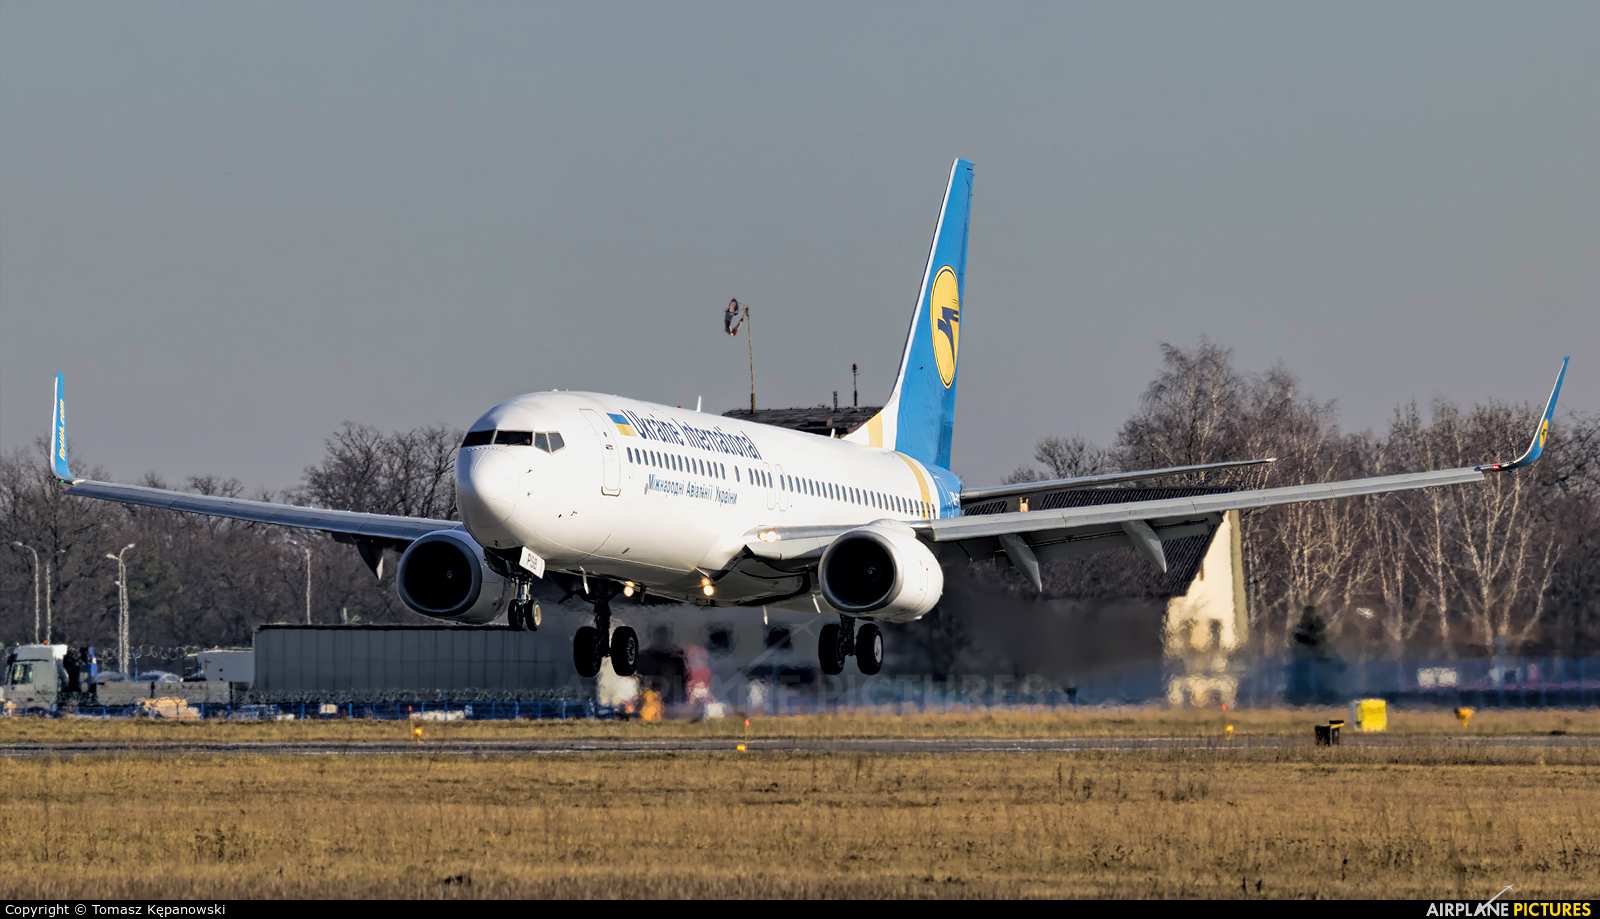 Ukraine International Airlines UR-PSB aircraft at Rzeszów-Jasionka